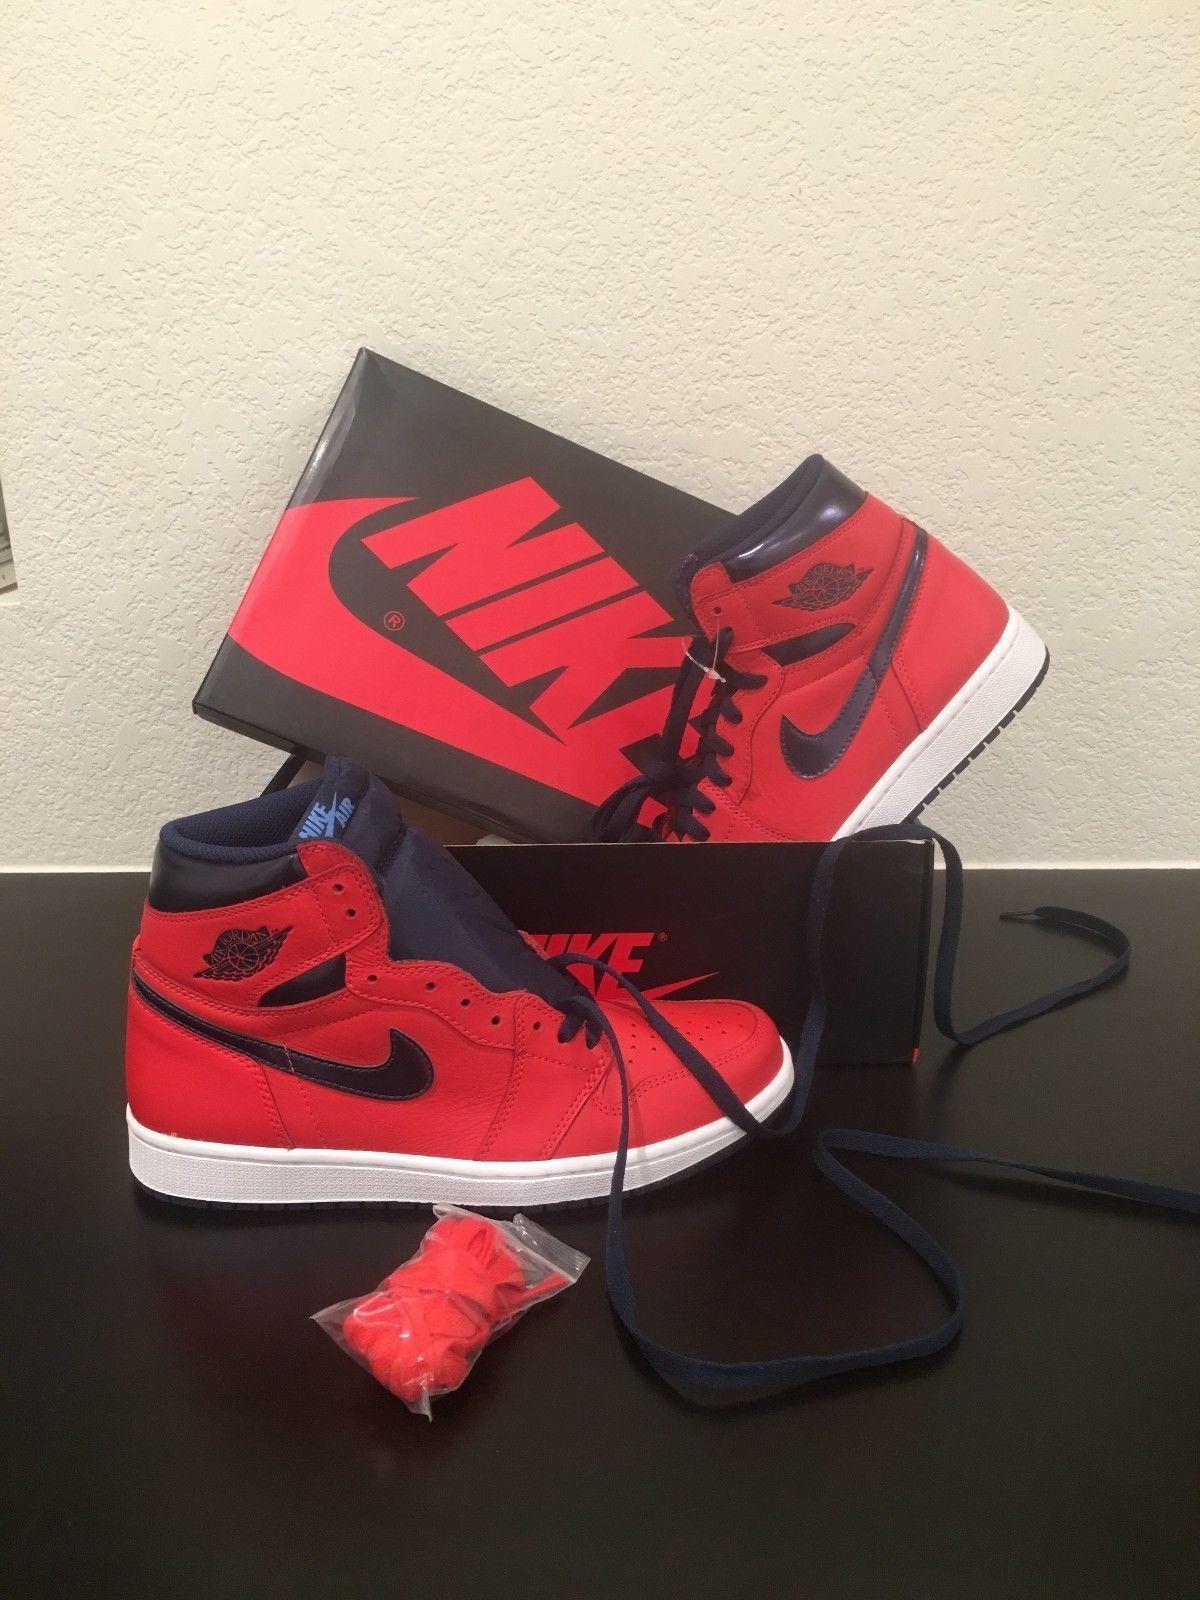 Brand New Air Jordan 1 Retro High Og and 30 similar items 6ee608cc3